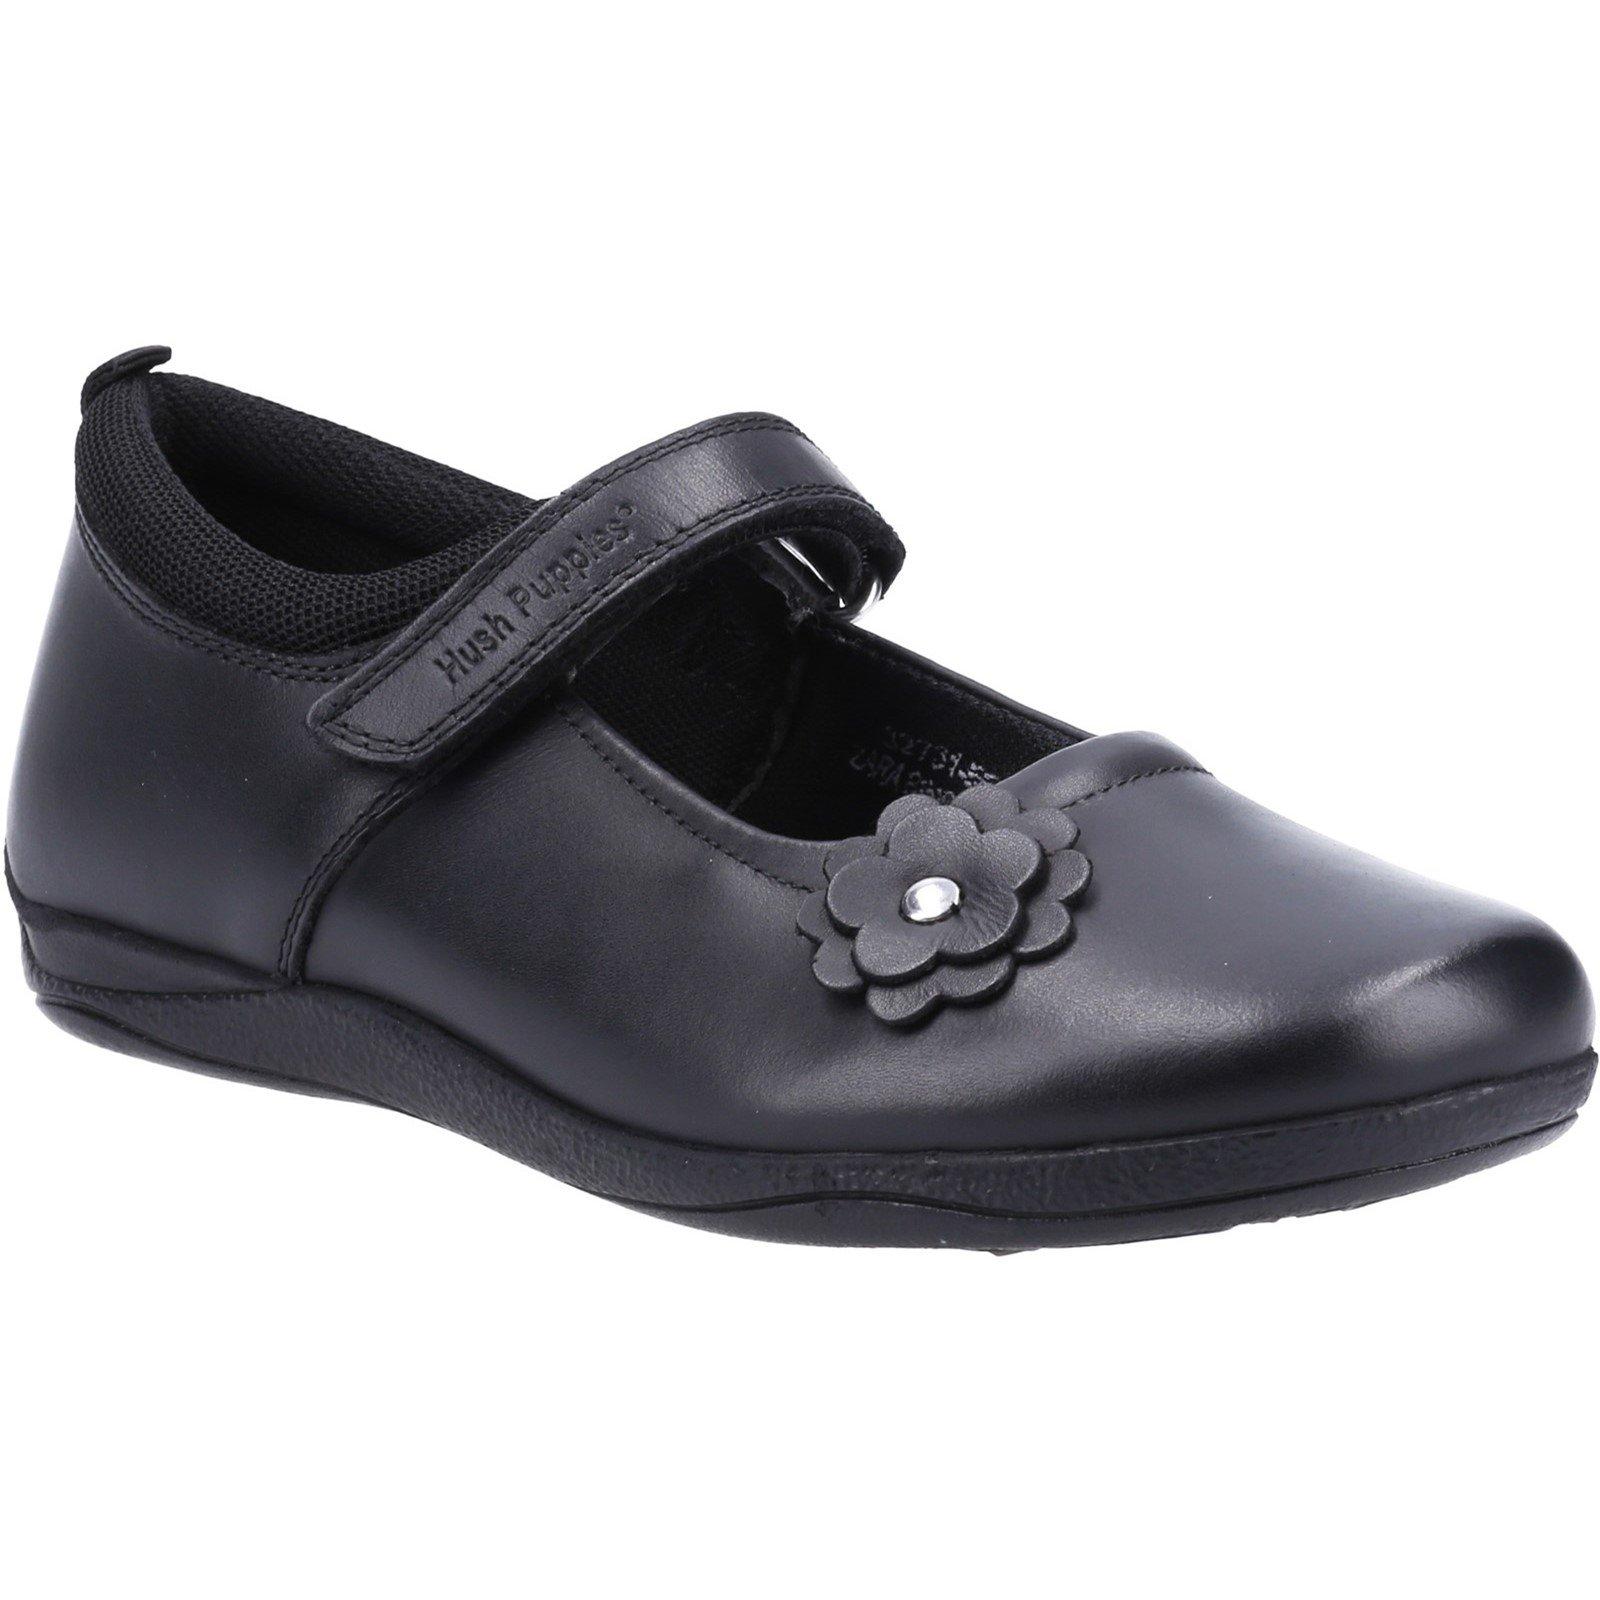 Hush Puppies Kid's Zara Junior School Flat Shoe Black 32731 - Black 12